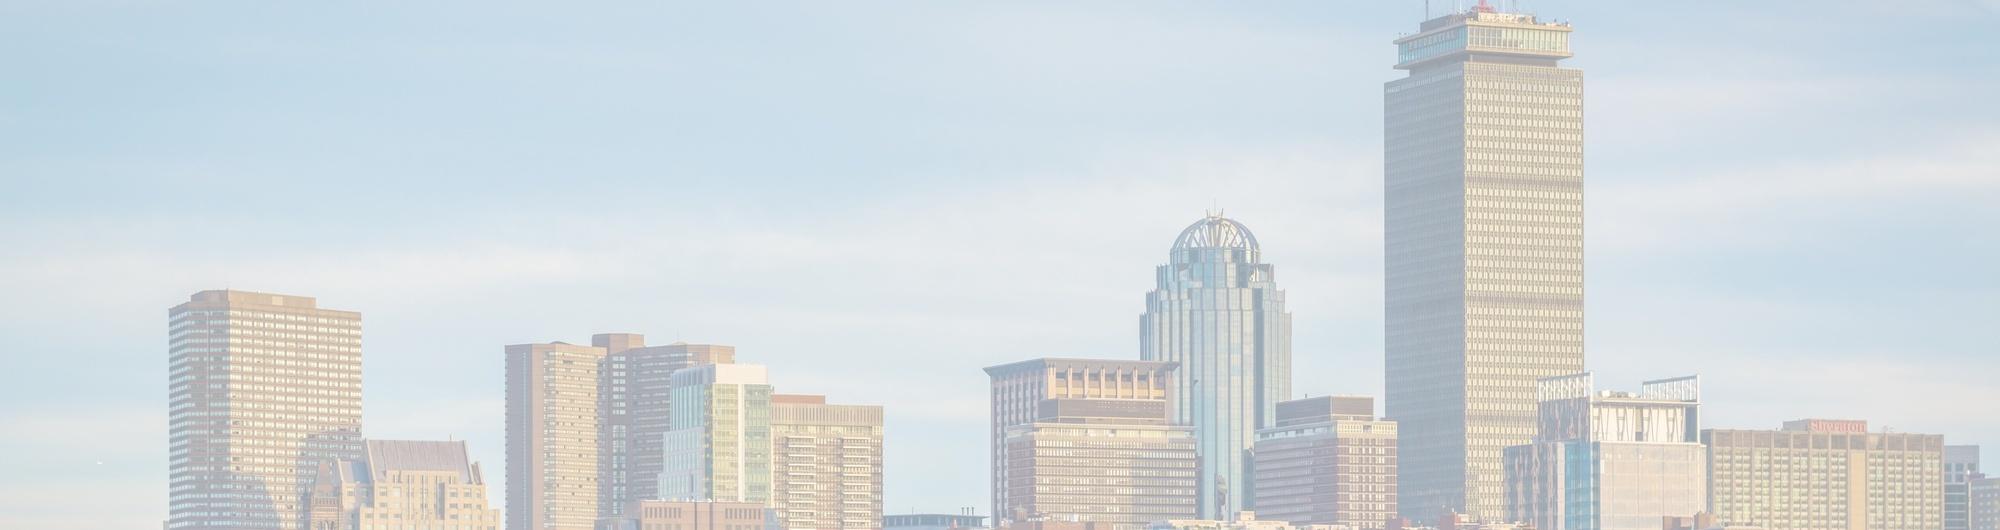 Boston Skylinev2.jpg